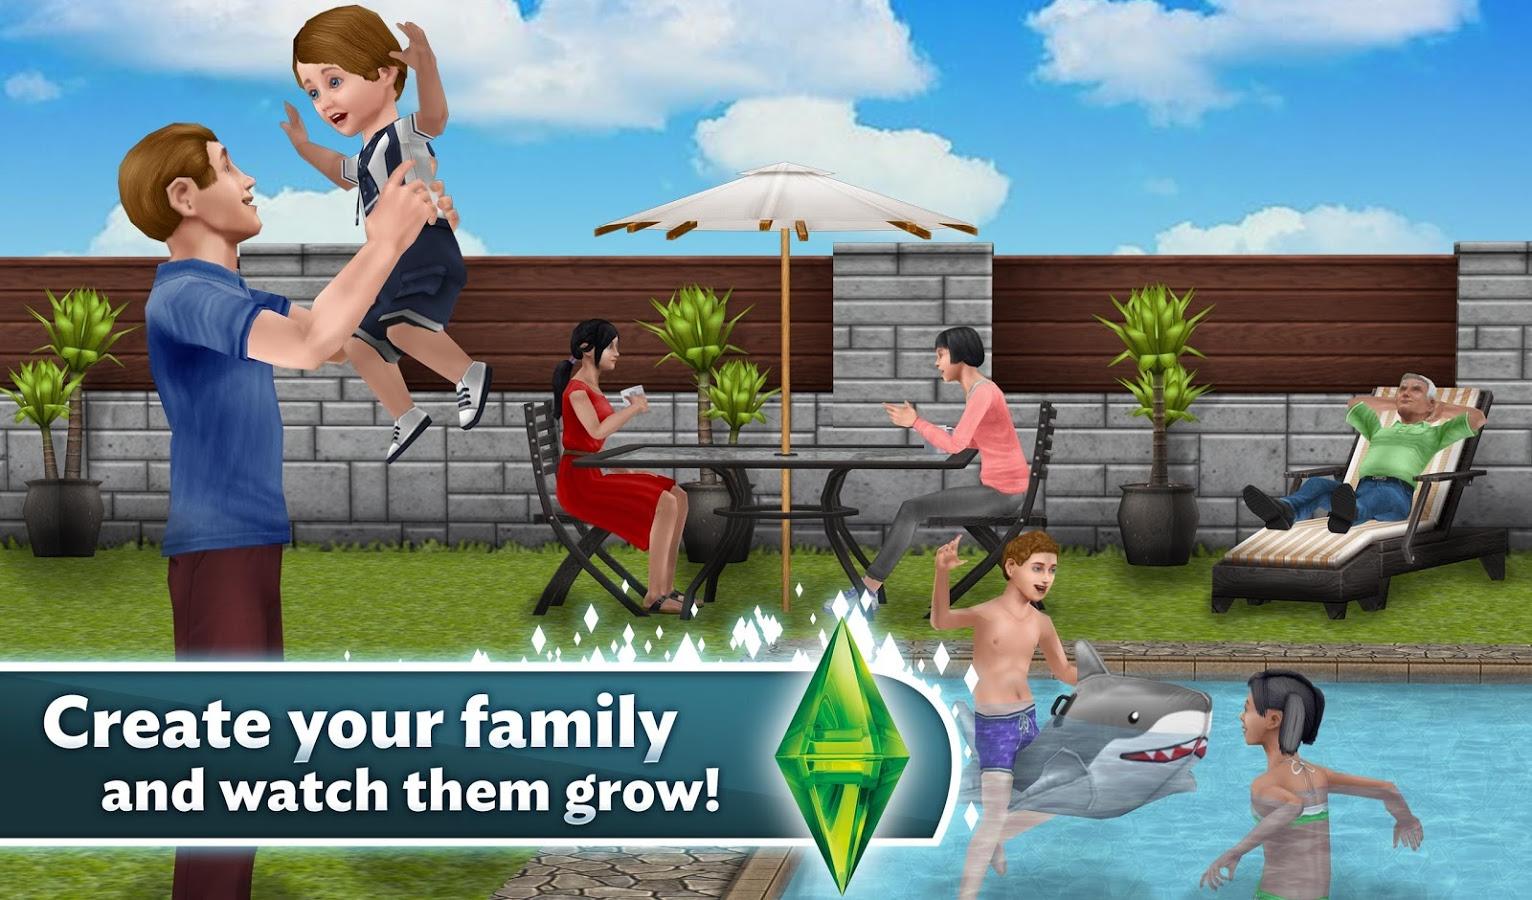 Sims FreePlay 5.21.0 MOD APK+DATA (UNLIMITED MONEY)